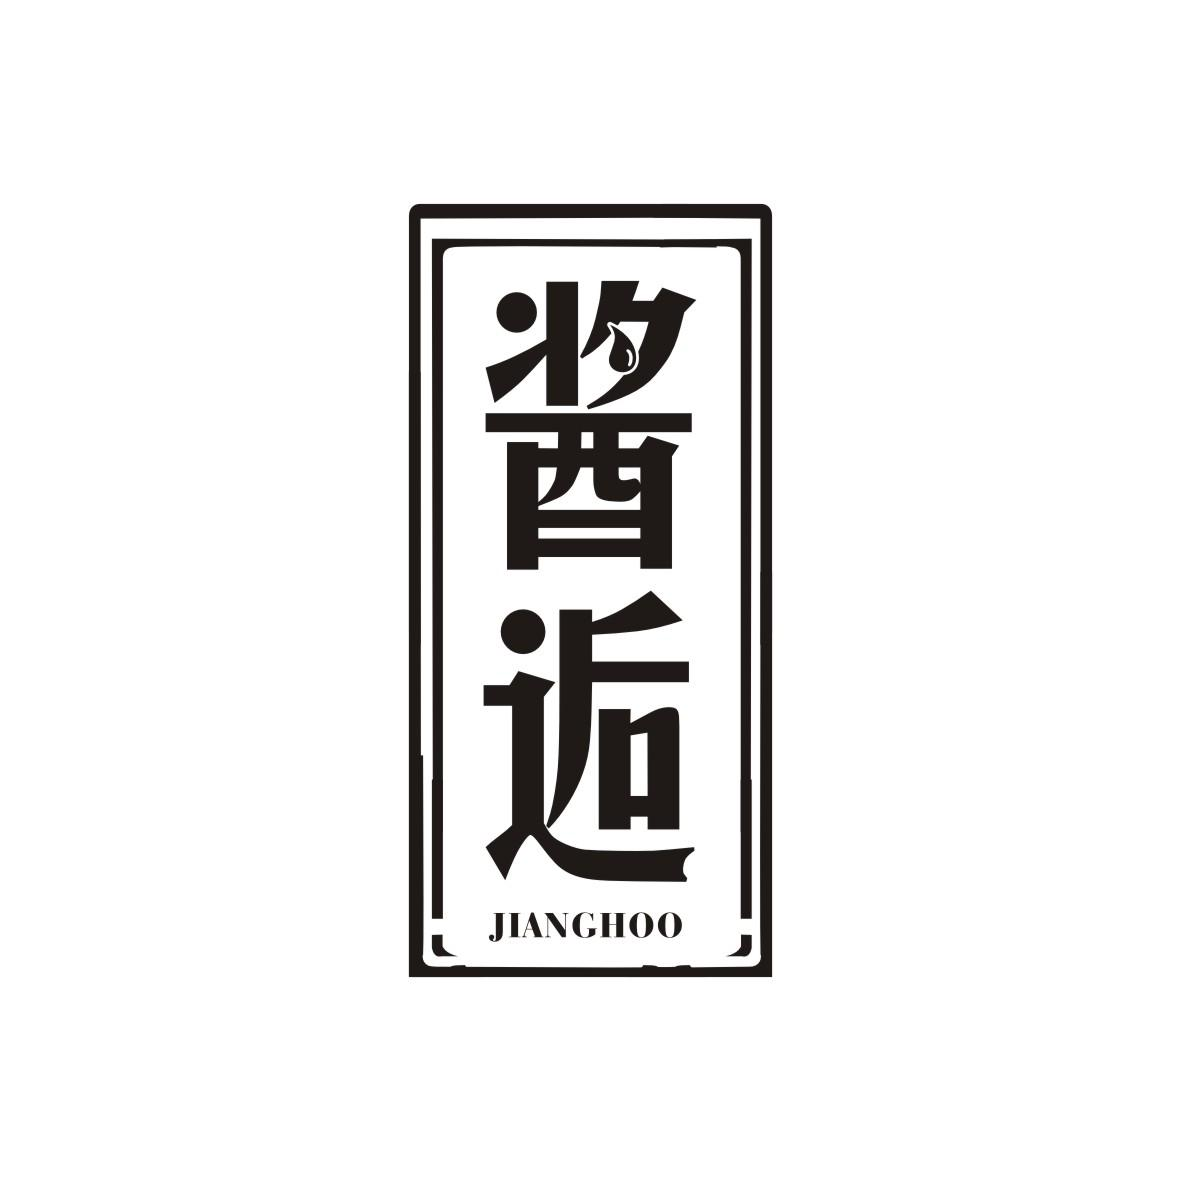 酱逅 JIANGHOO